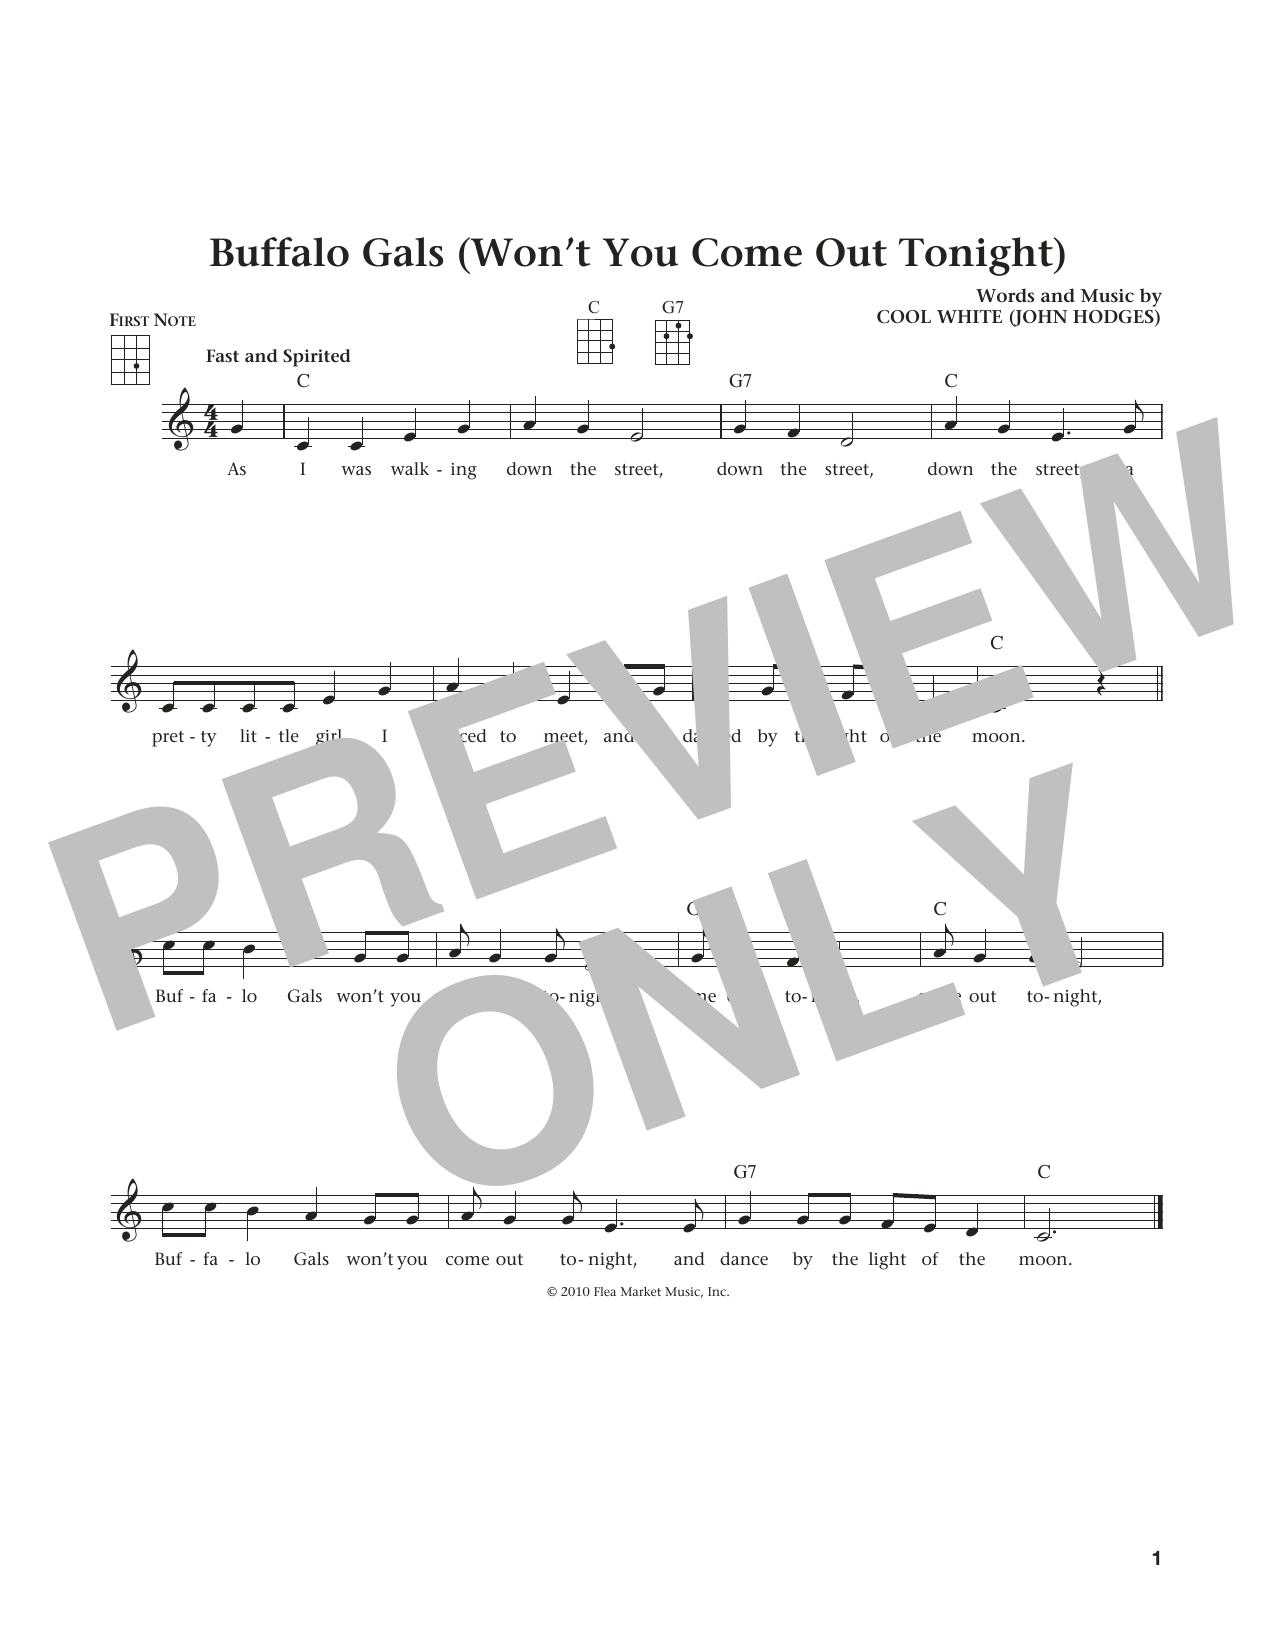 Buffalo Gals (Won't You Come Out Tonight?) (from The Daily Ukulele) (arr. Liz and Jim Beloff) (Ukulele)